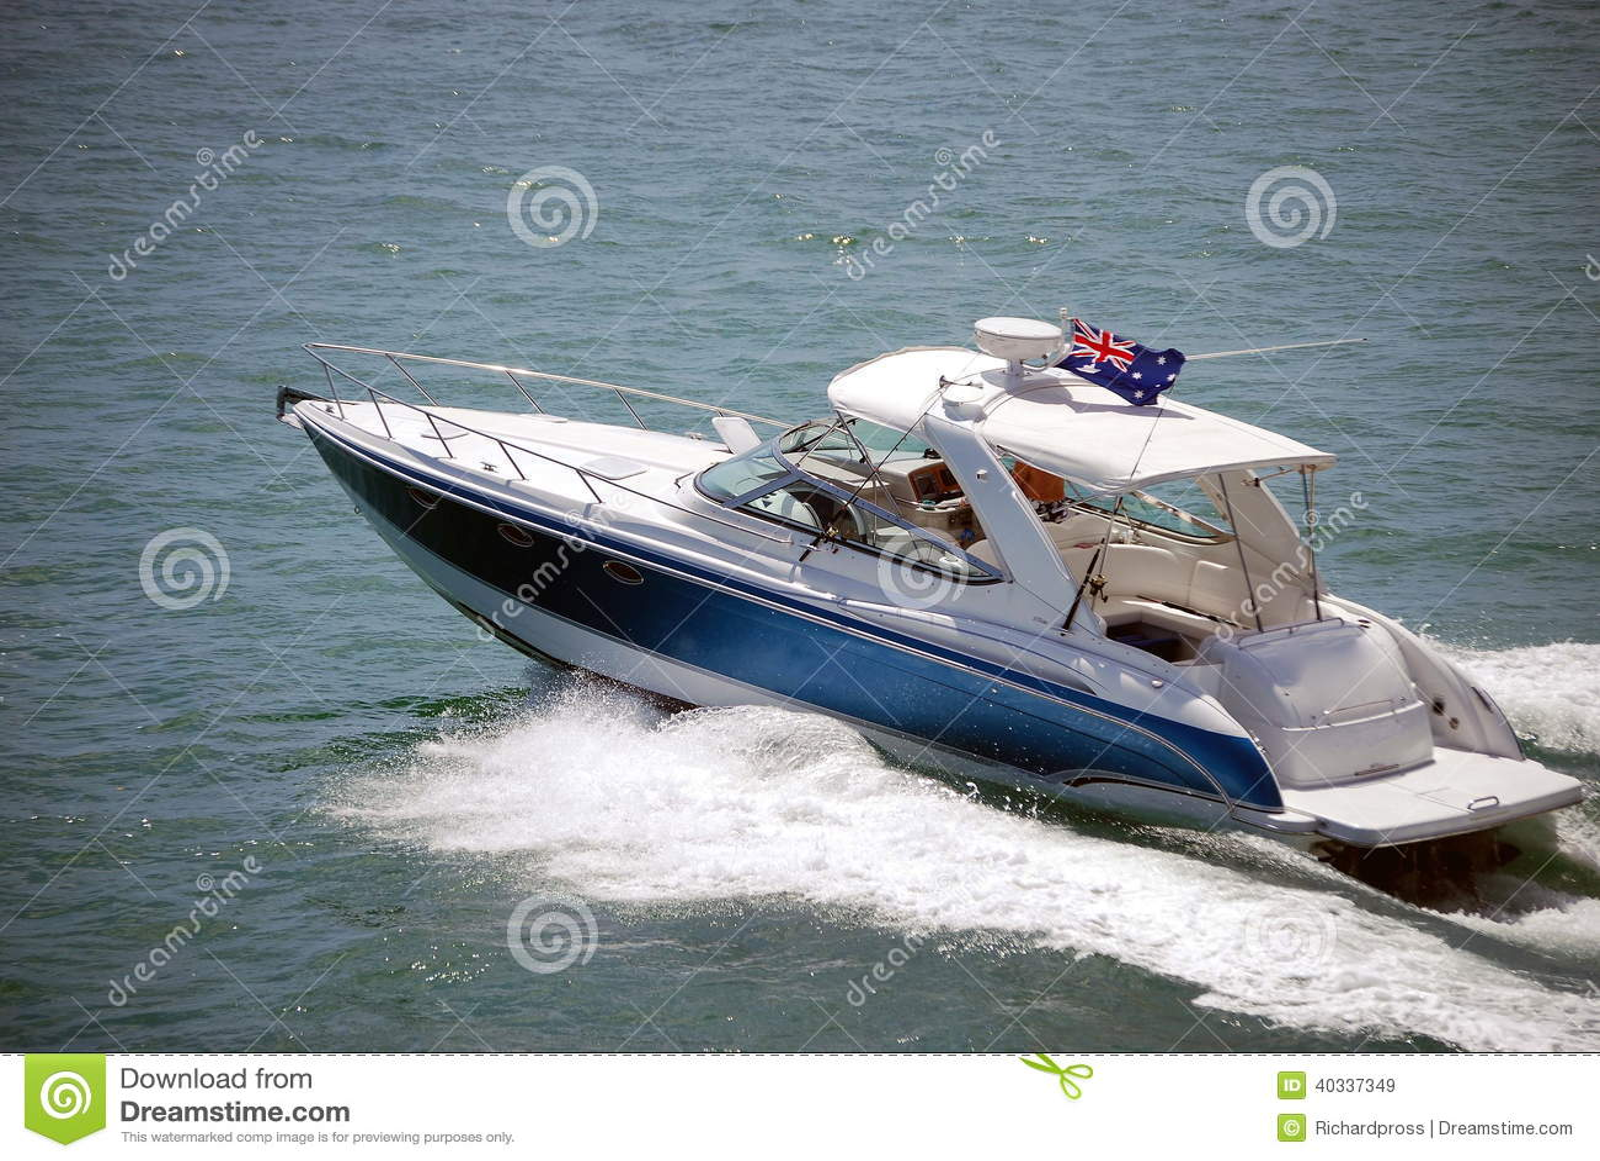 Luxury sport fishing boat stock photo image 40337349 for Deep sea fishing bay area